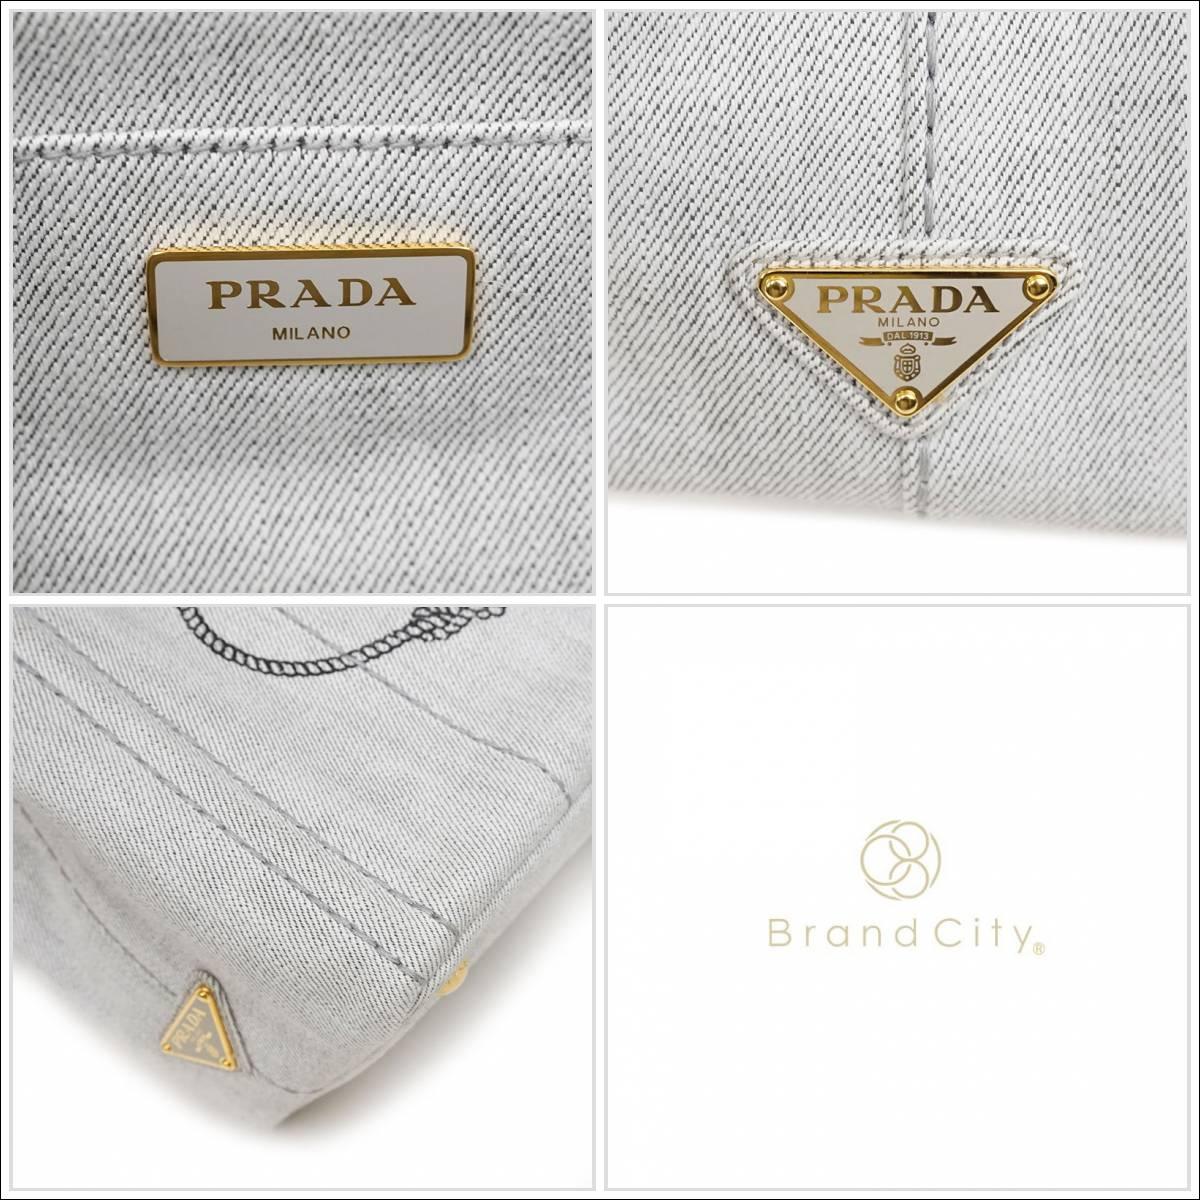 eb5090c44ba2 BrandCity: Plastic Dacca Napa 2WAY tote bag 1BG439 BIANCO | Rakuten ...